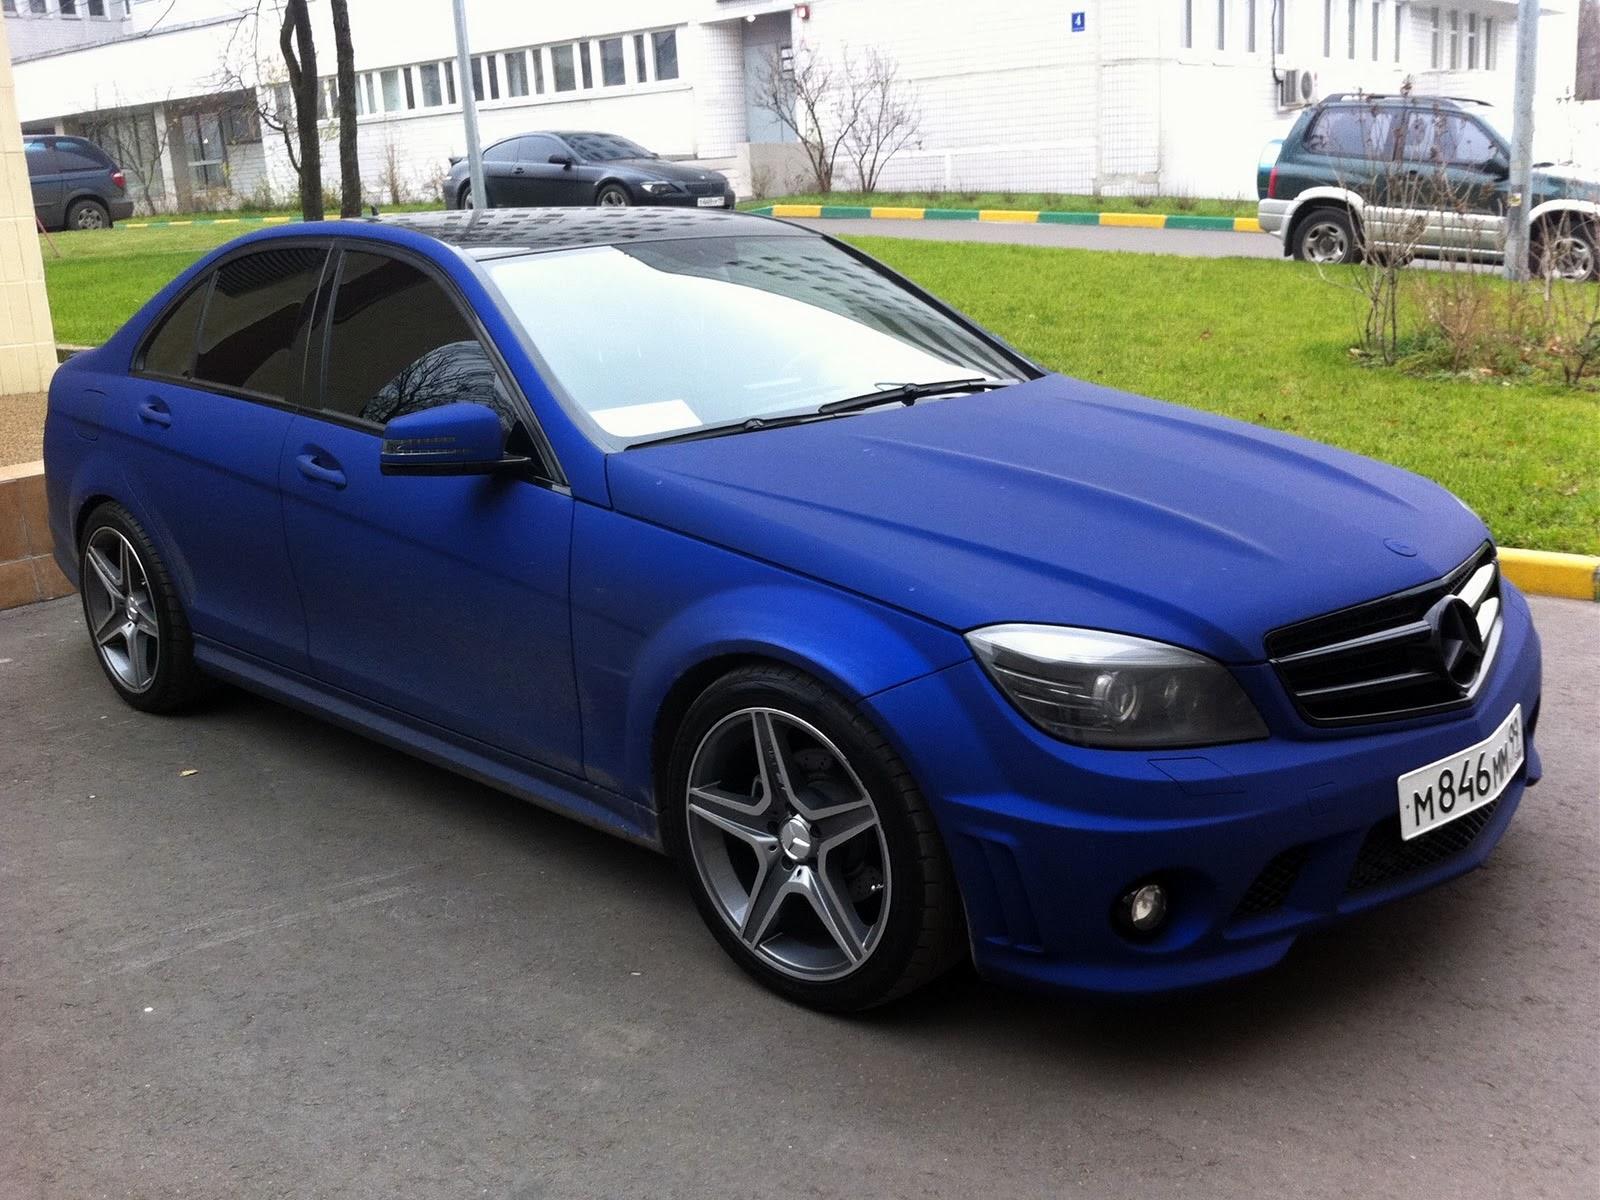 Mercedes-Benz W204 Blue VELVET | BENZTUNING